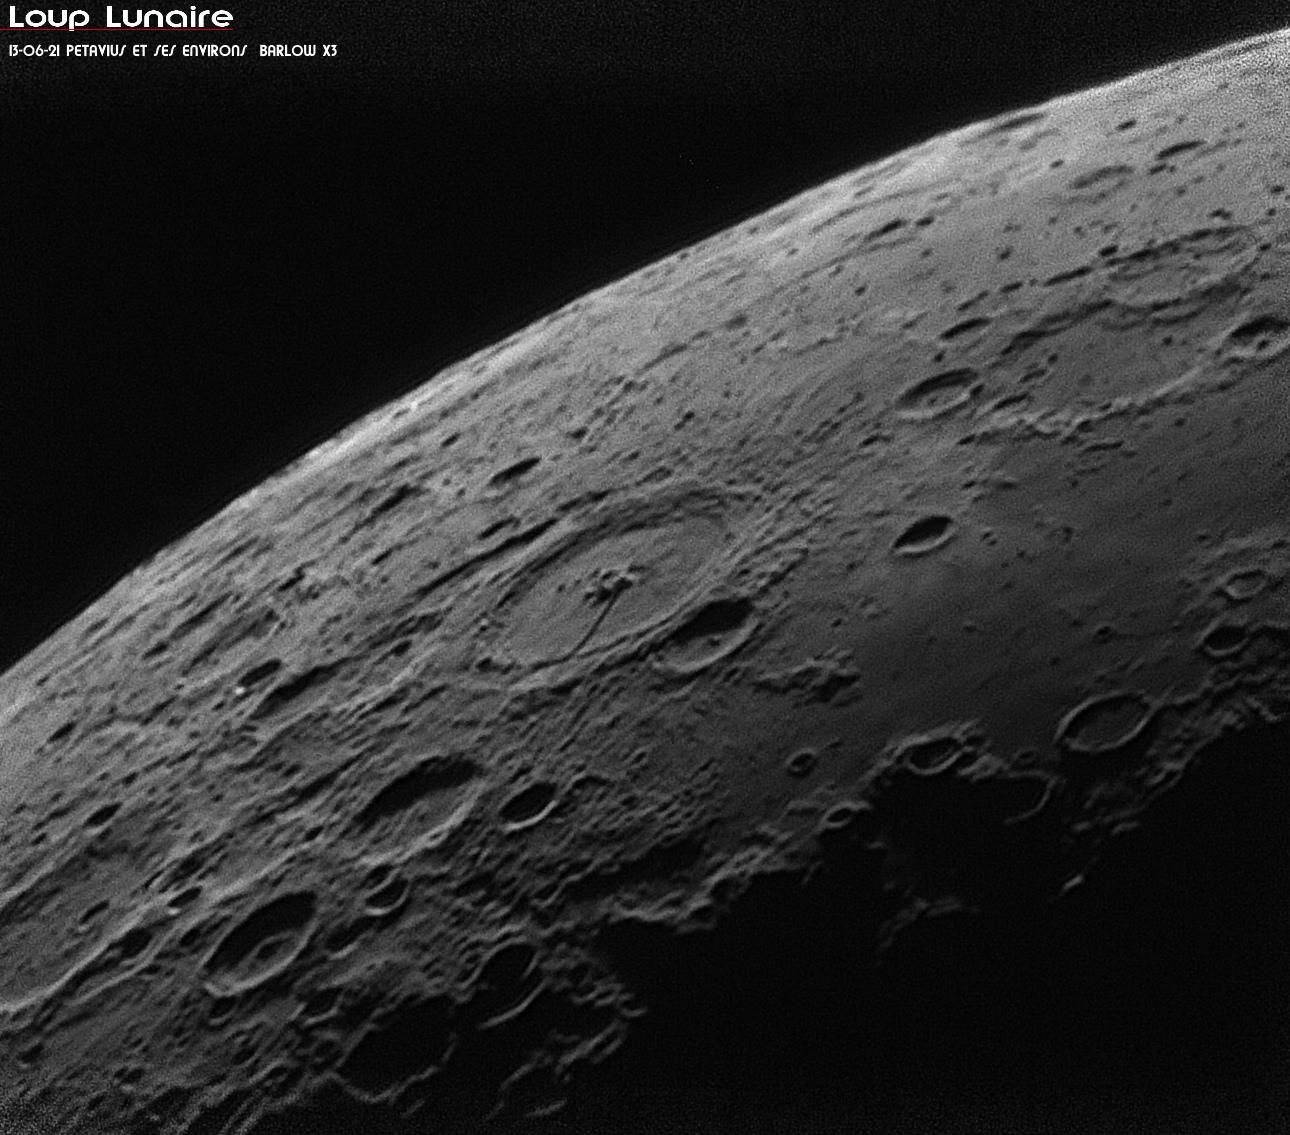 2021-06-13-2033_7-LUNE_lapl4_ap110000000.jpg